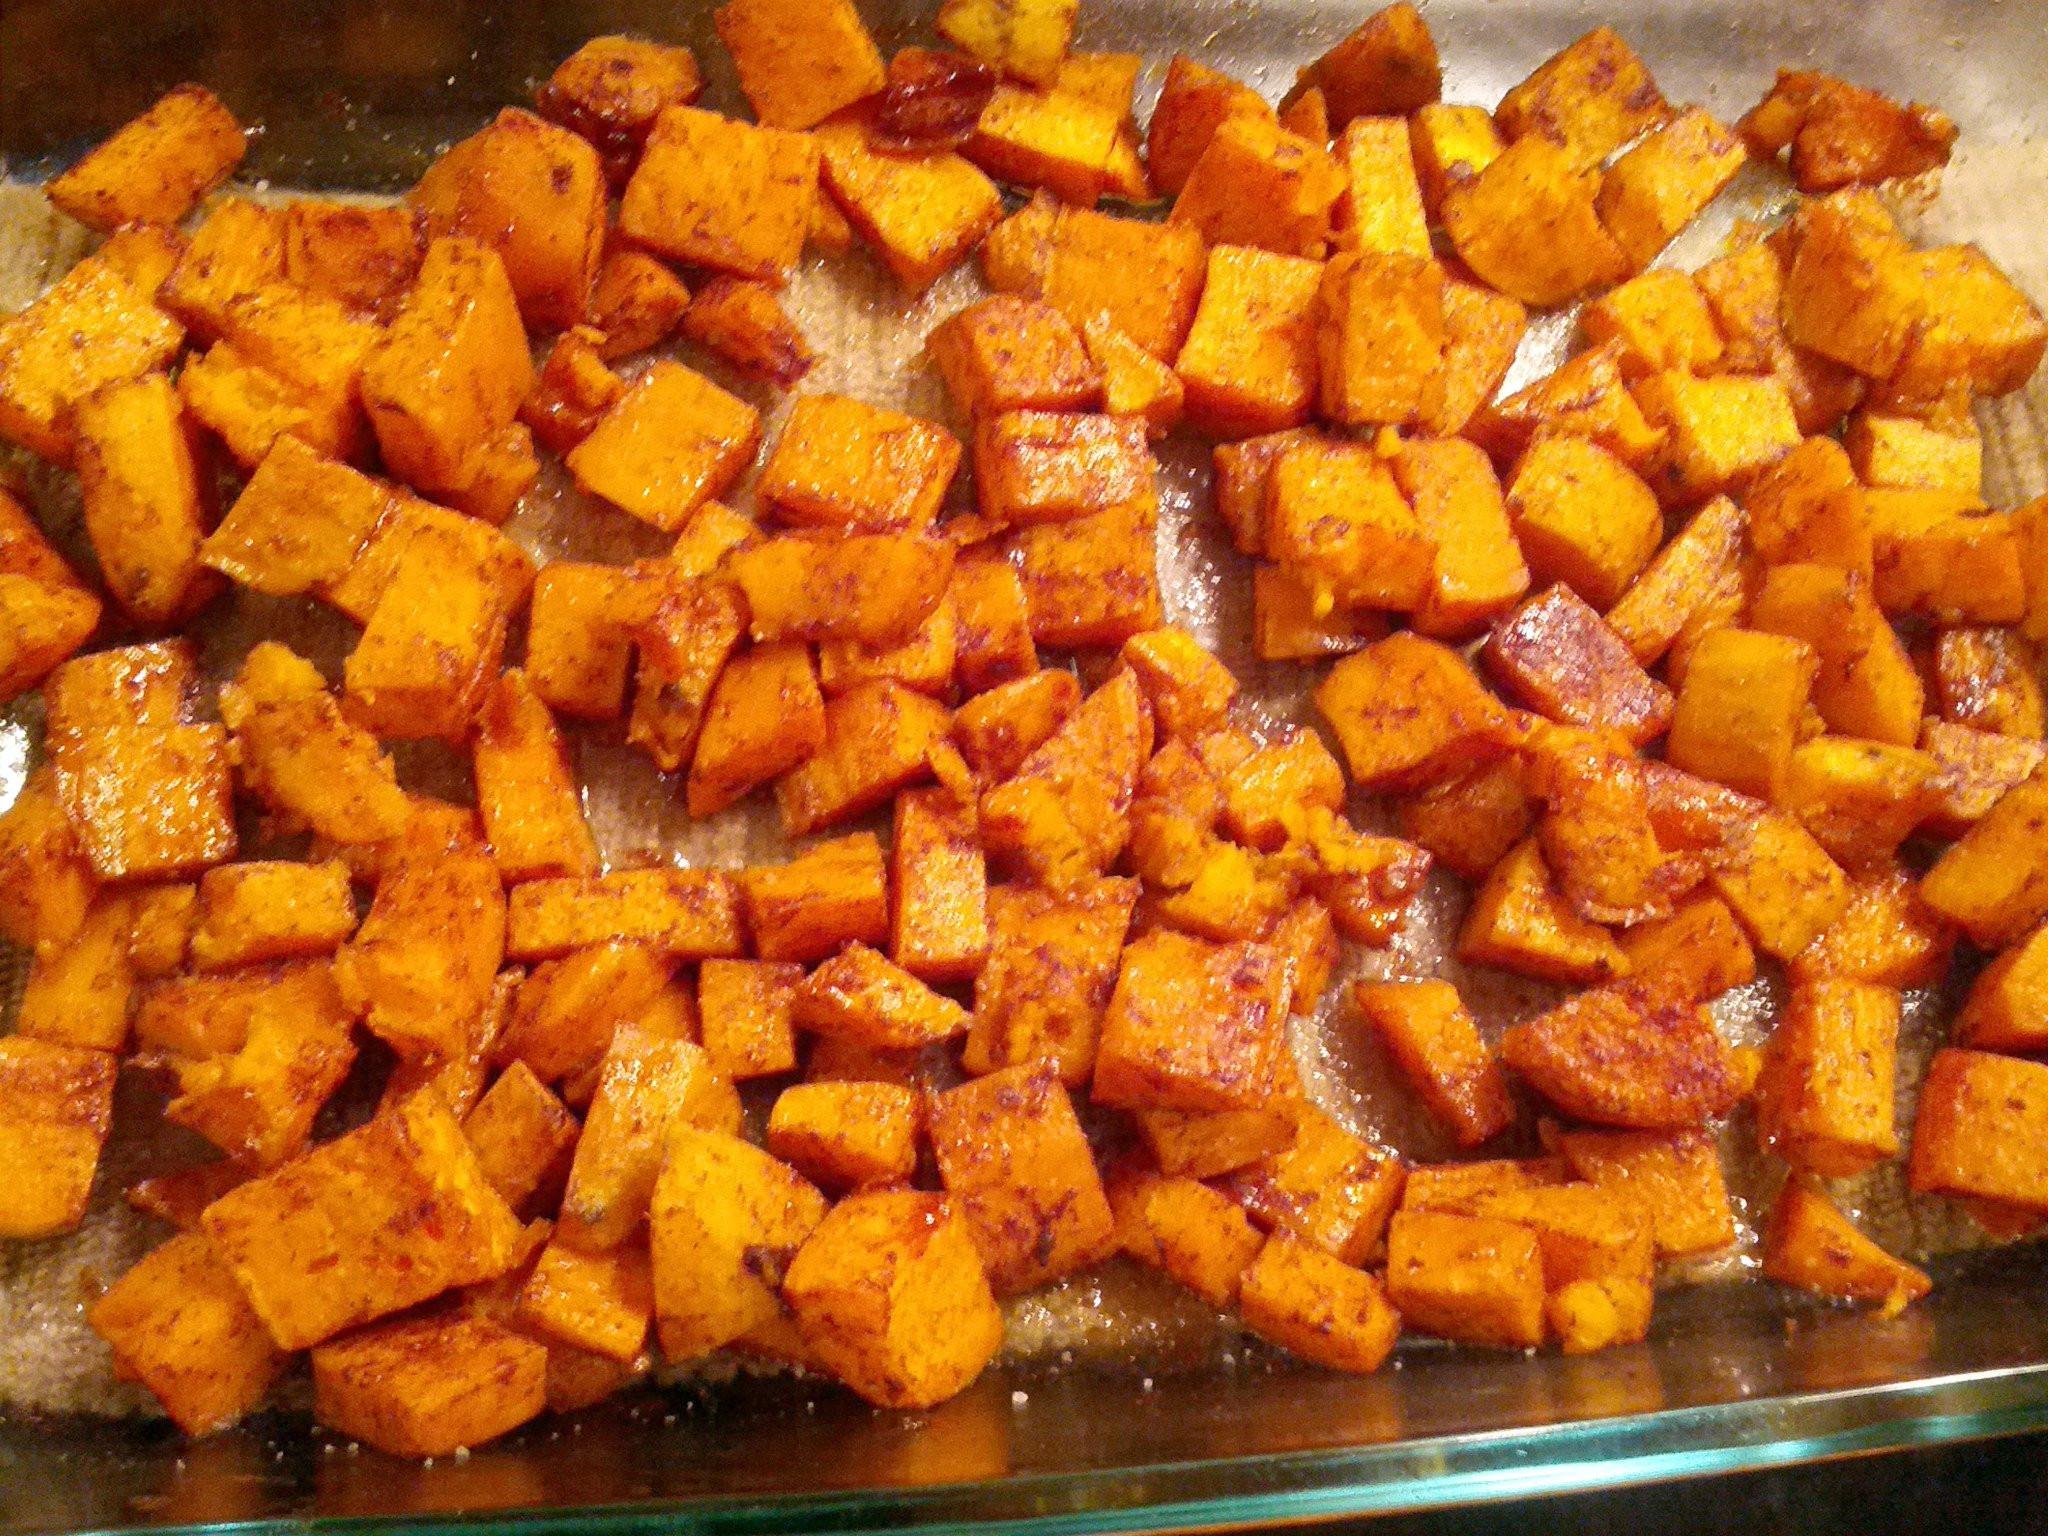 Roasted Sweet Potato Recipe  Roasted Spiced Sweet Potatoes